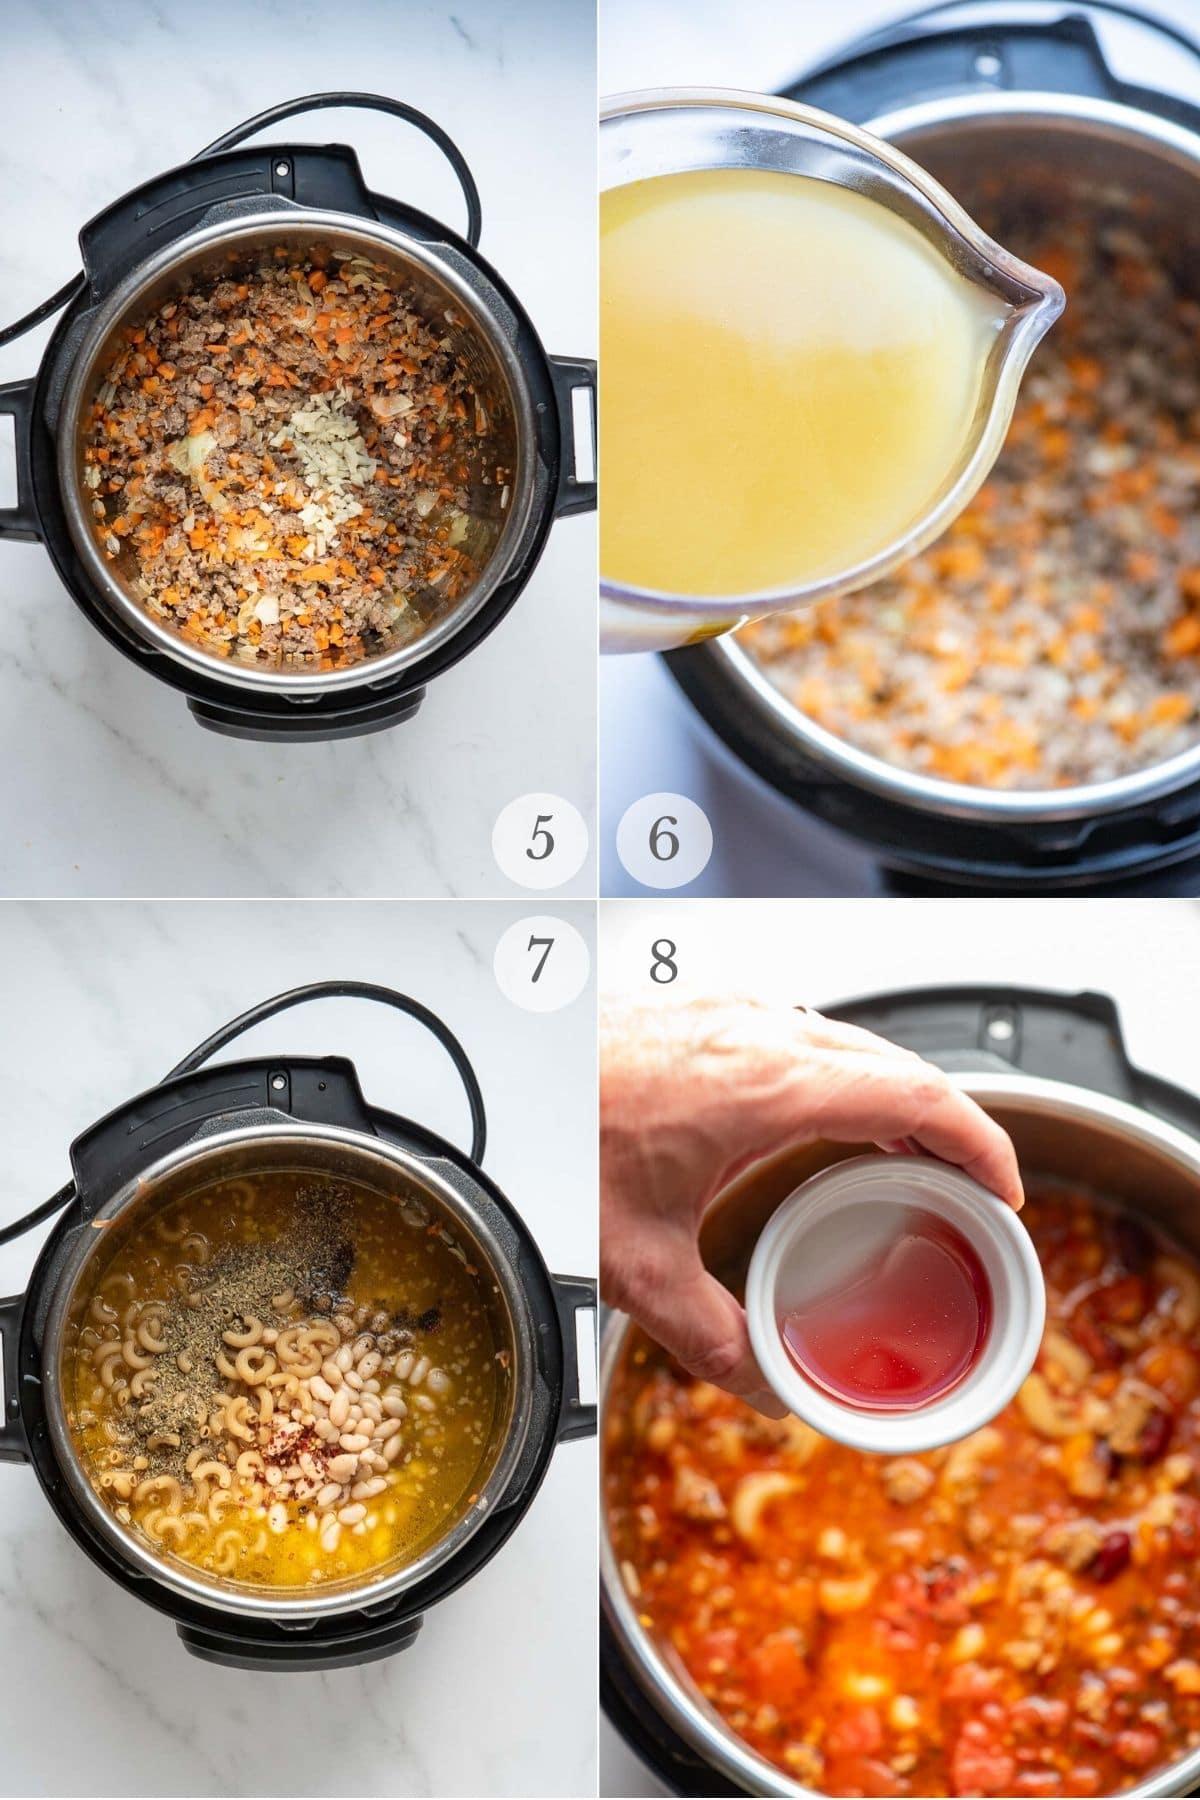 pasta e fagioli recipe steps 5-8